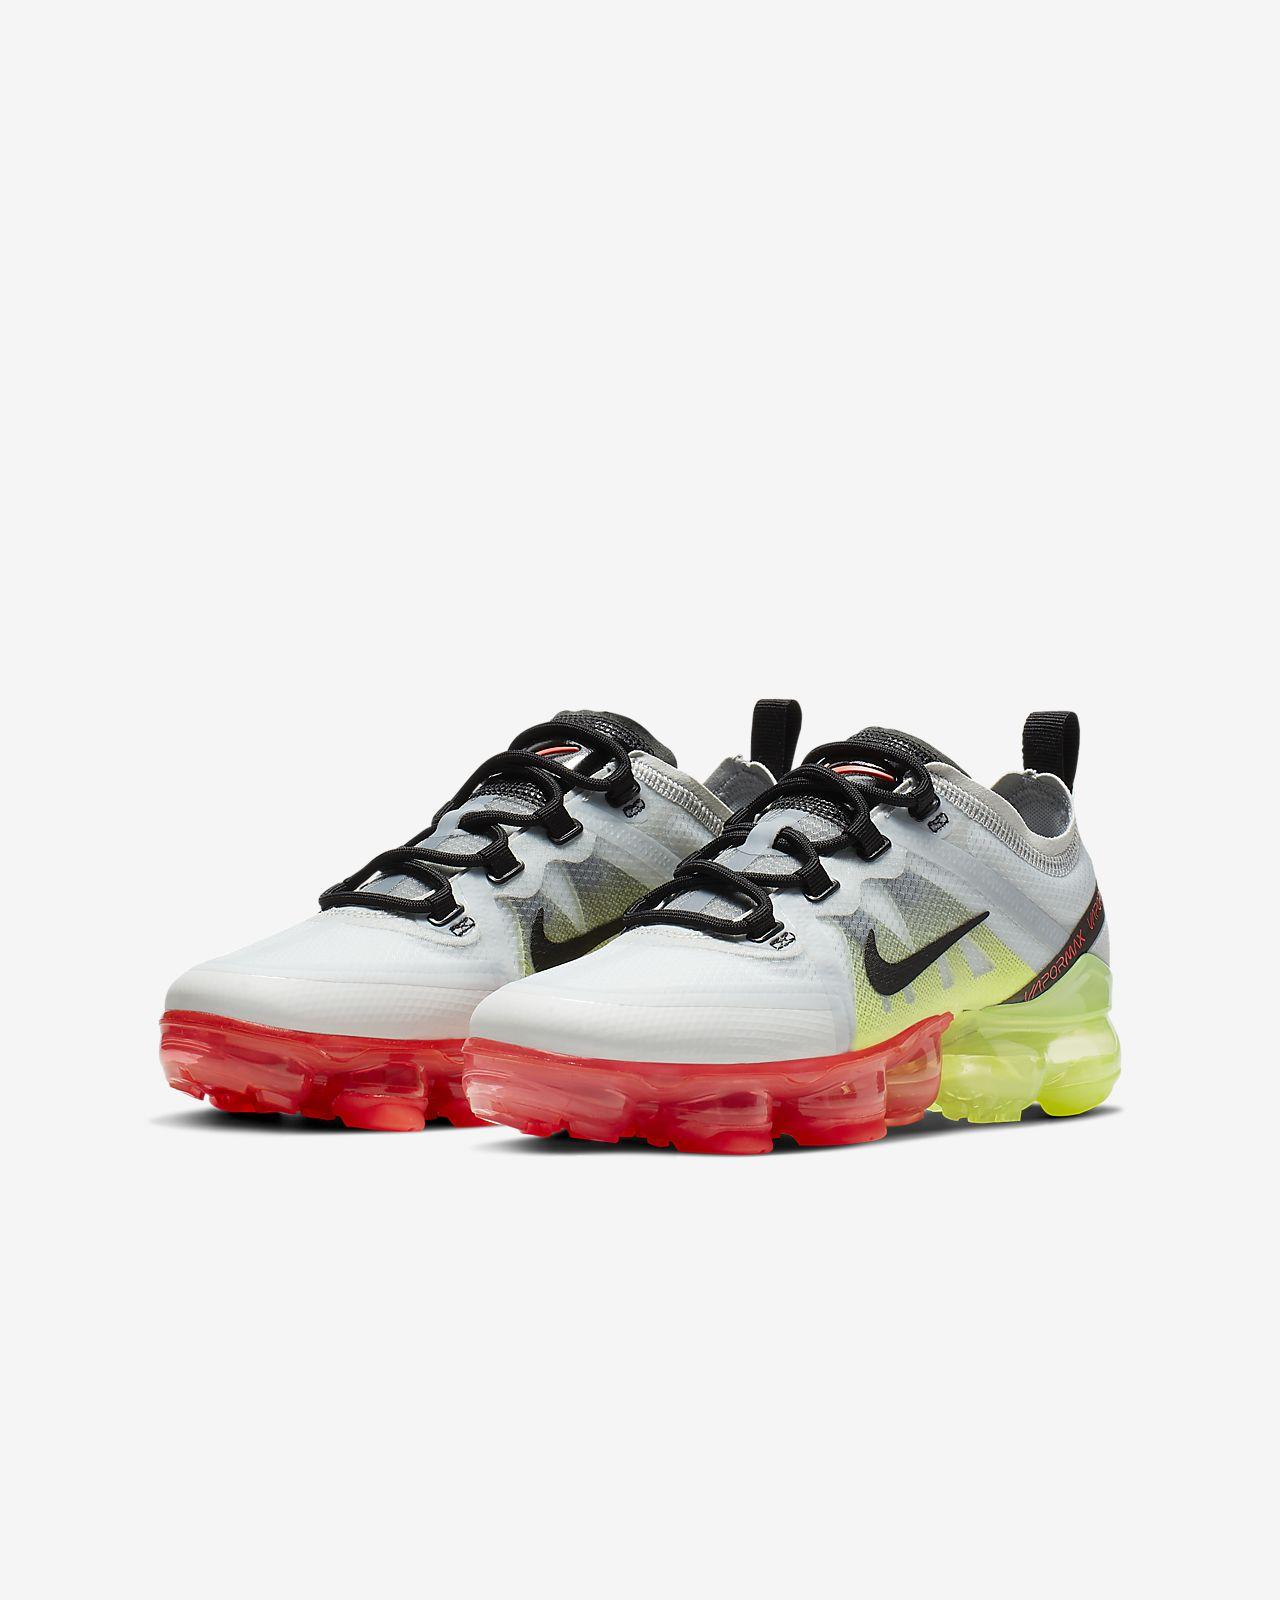 3f66db58a5 Nike Air VaporMax 2019 Older Kids' Shoe. Nike.com IE